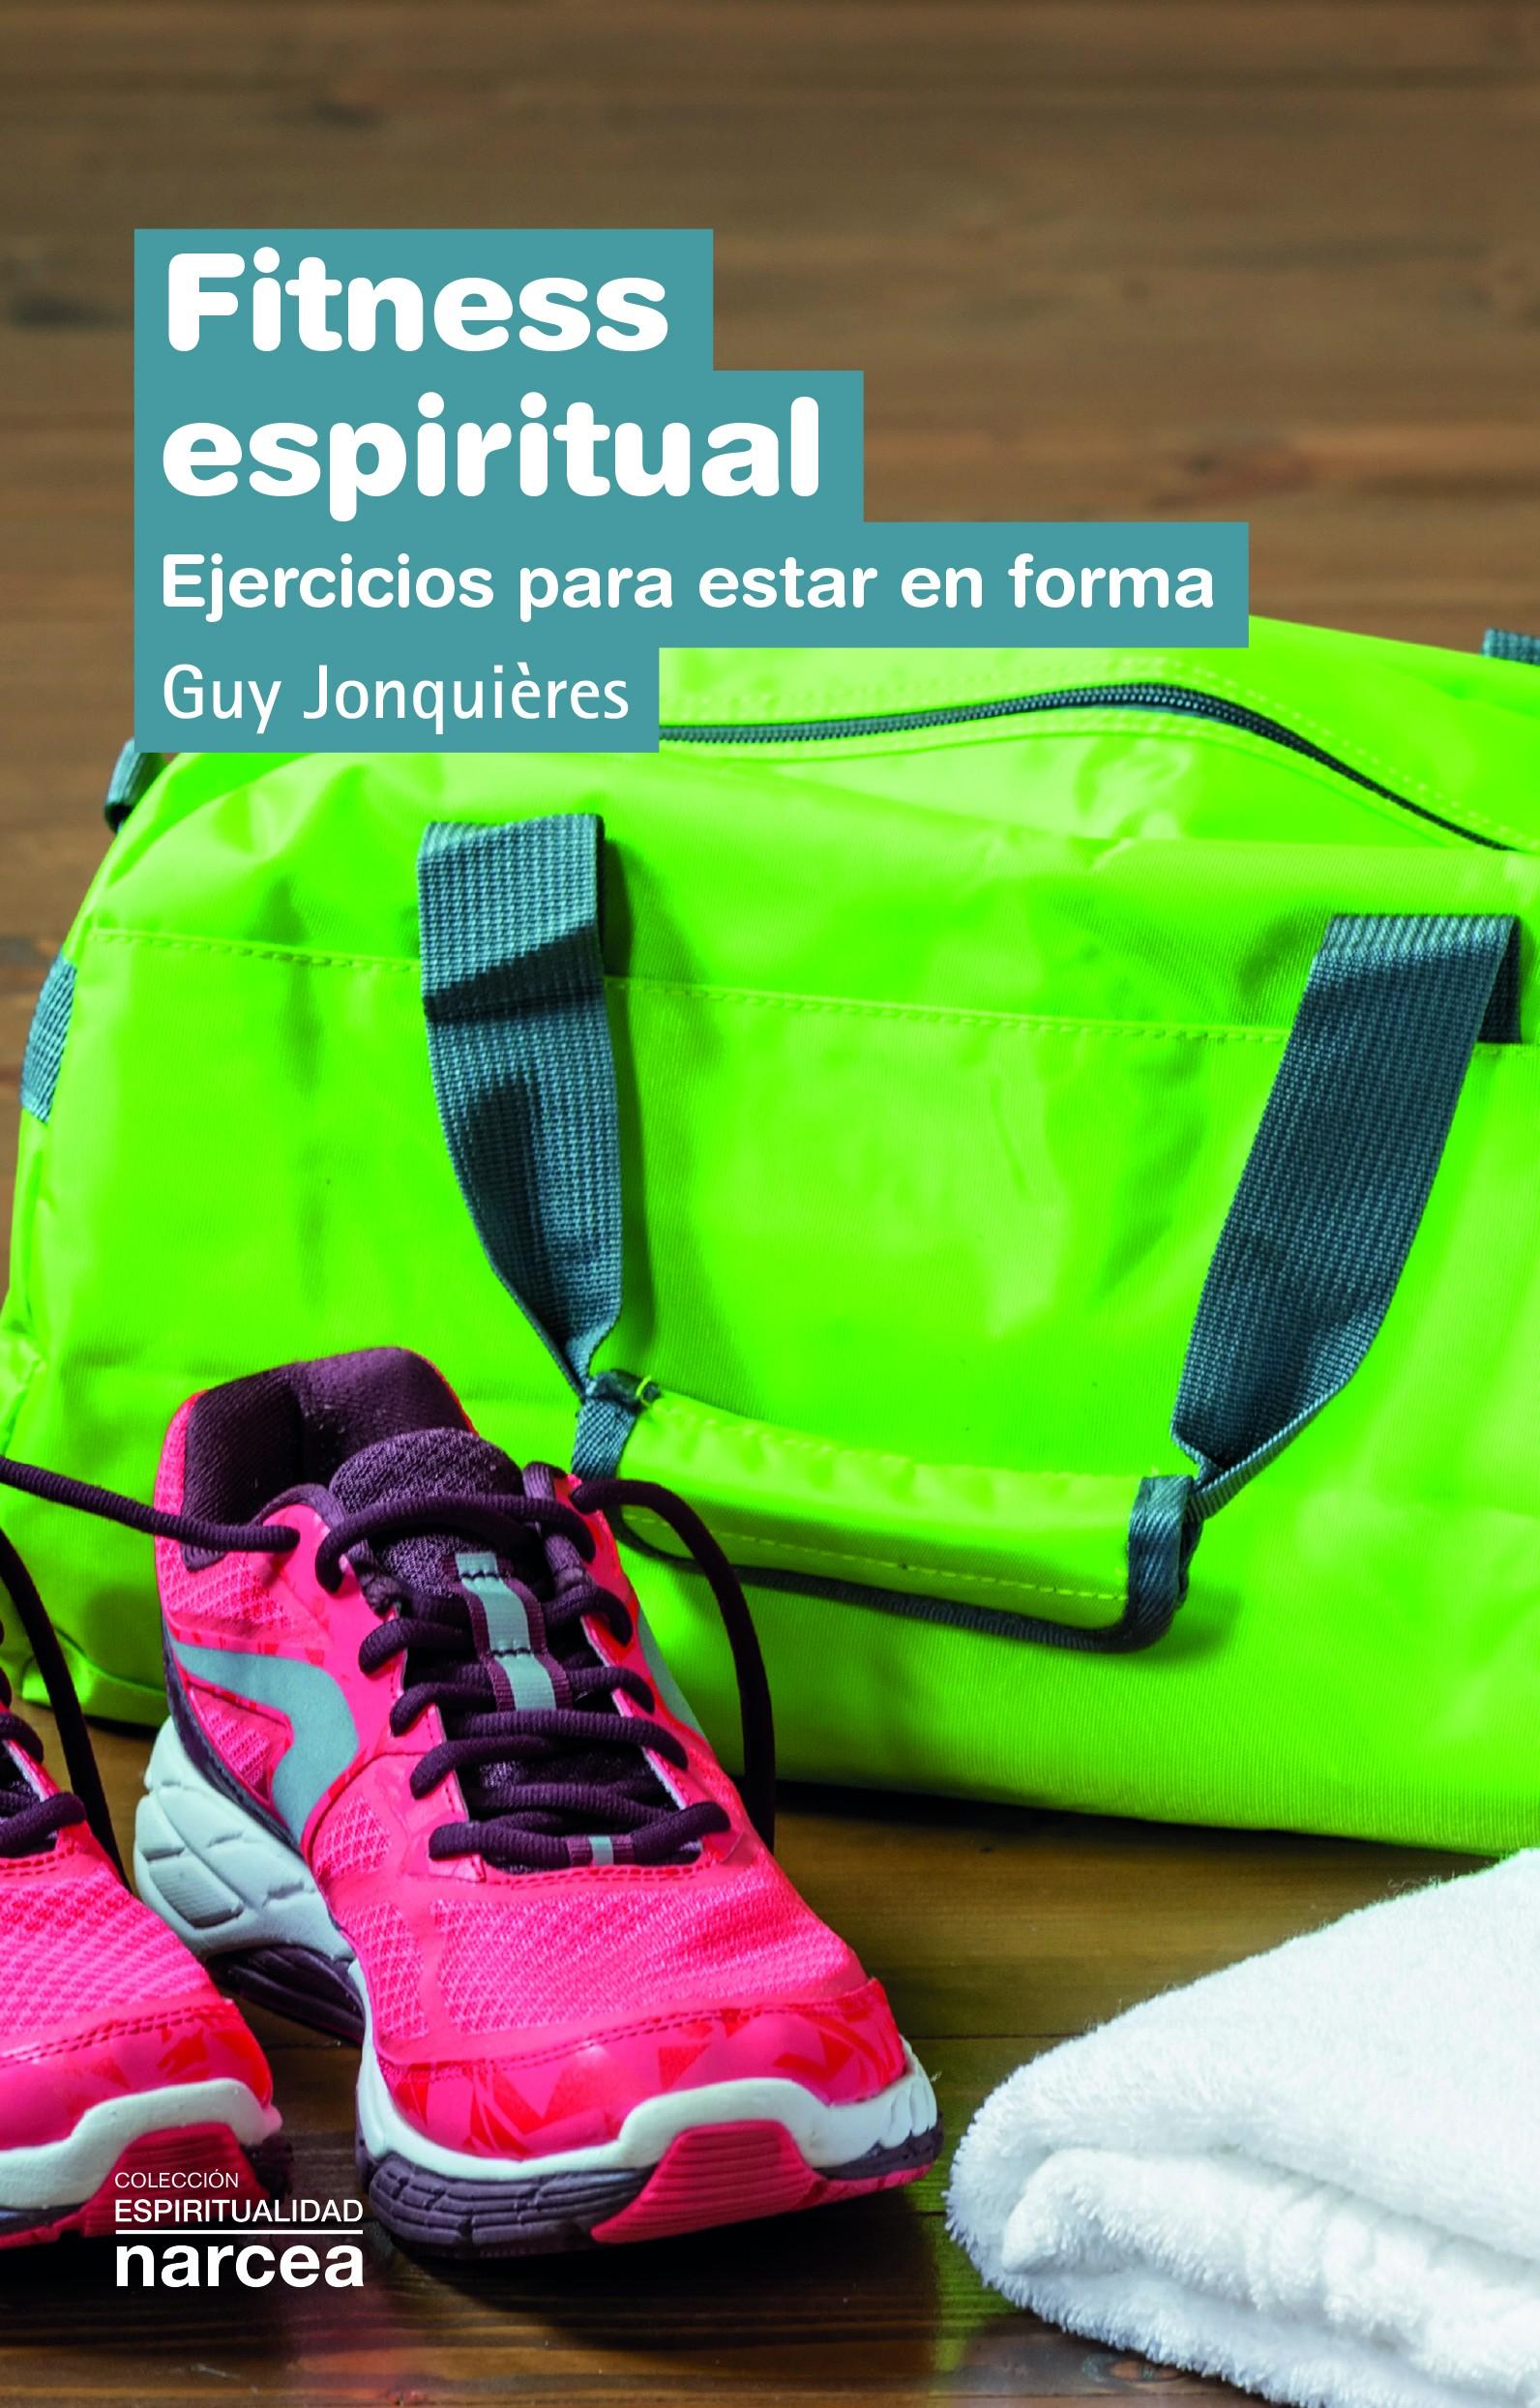 Fitness espiritual